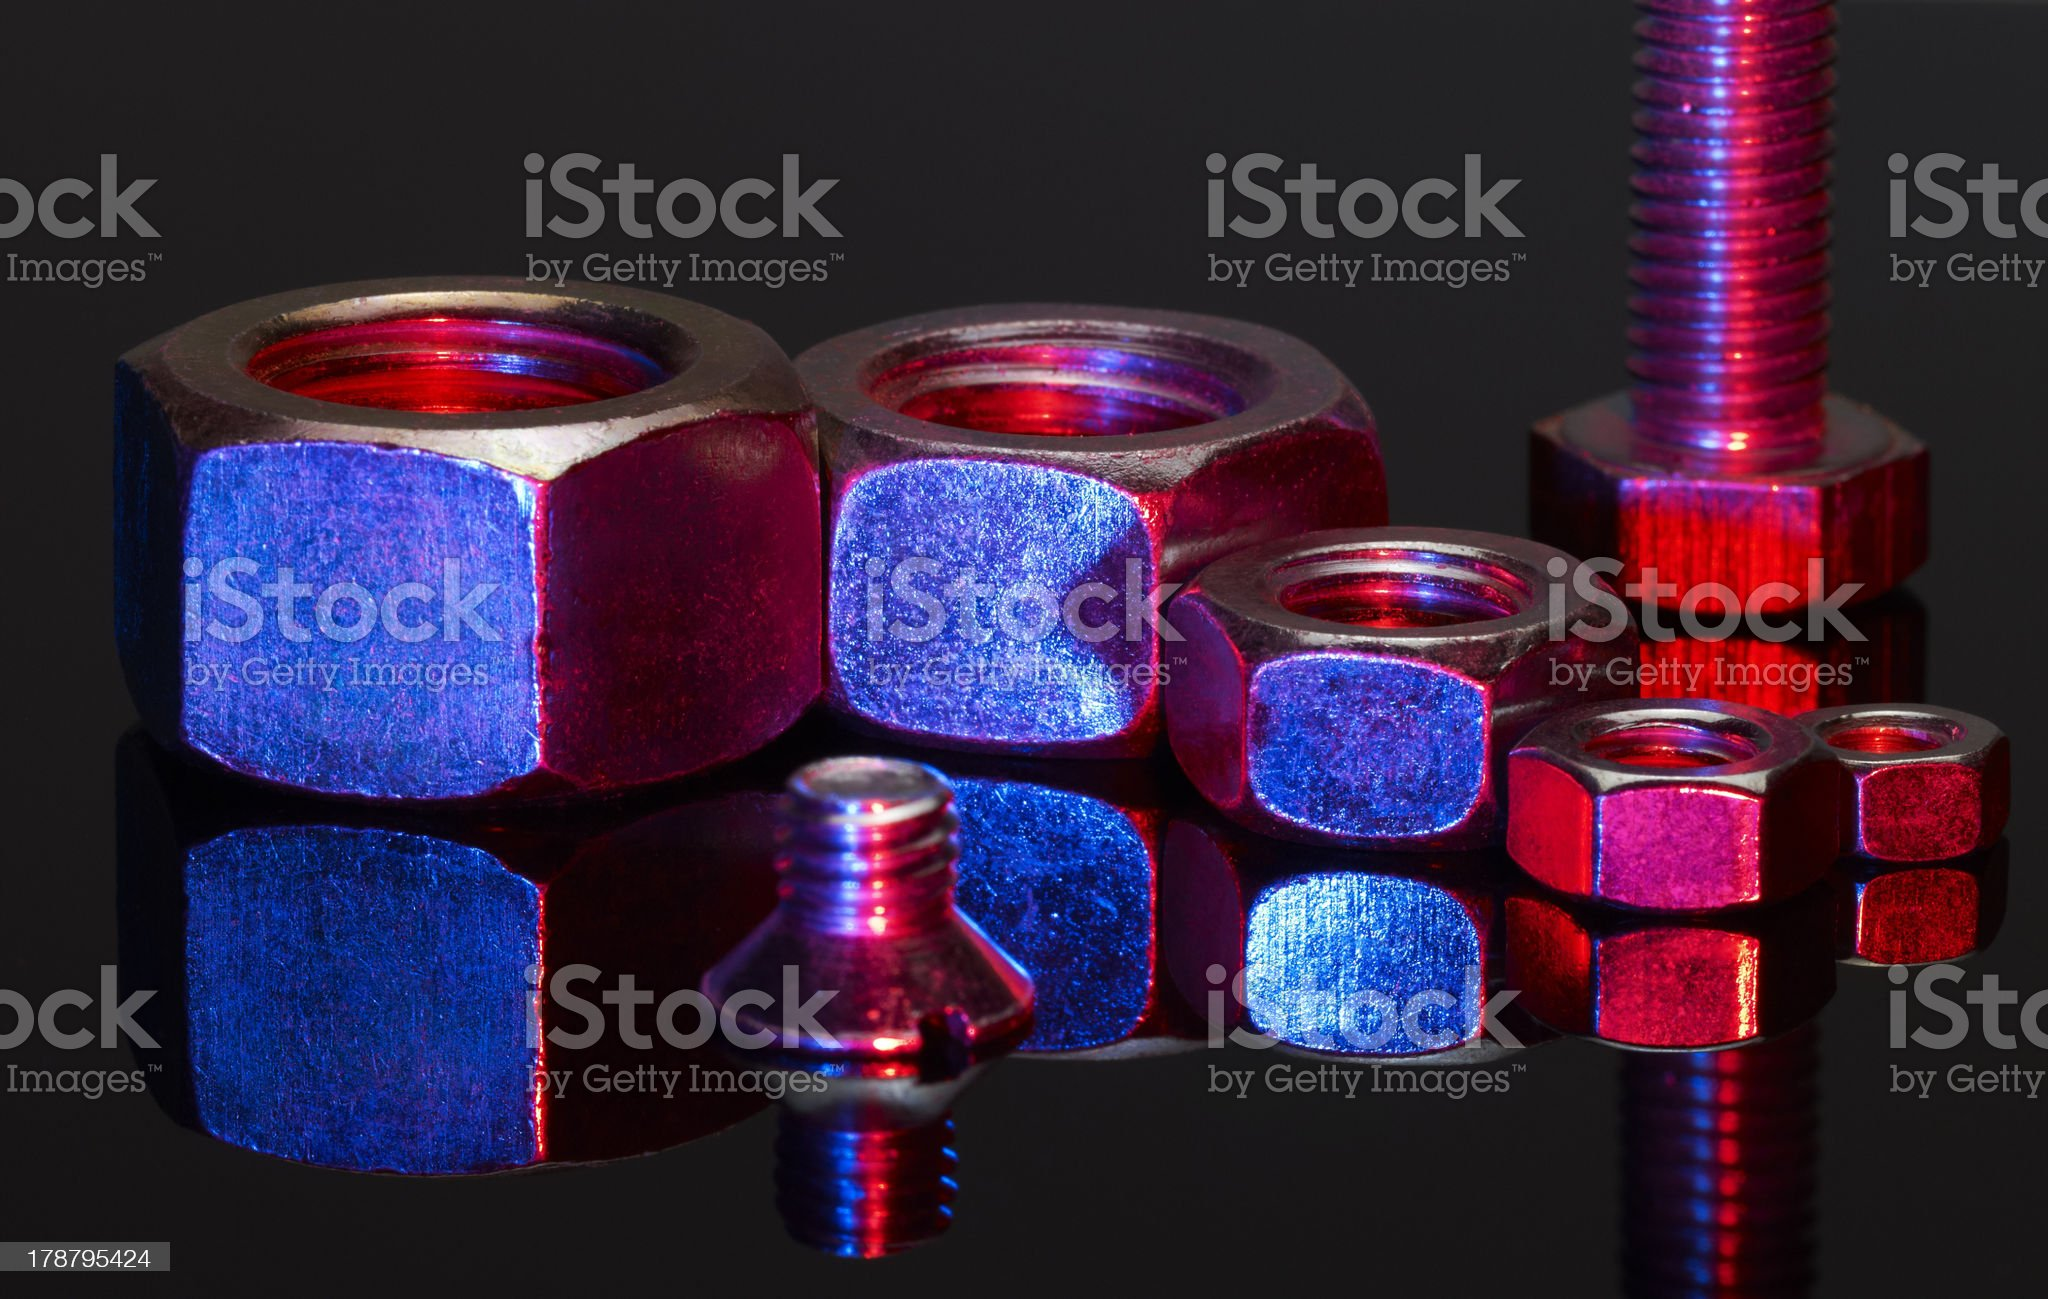 illuminated screw and nuts royalty-free stock photo